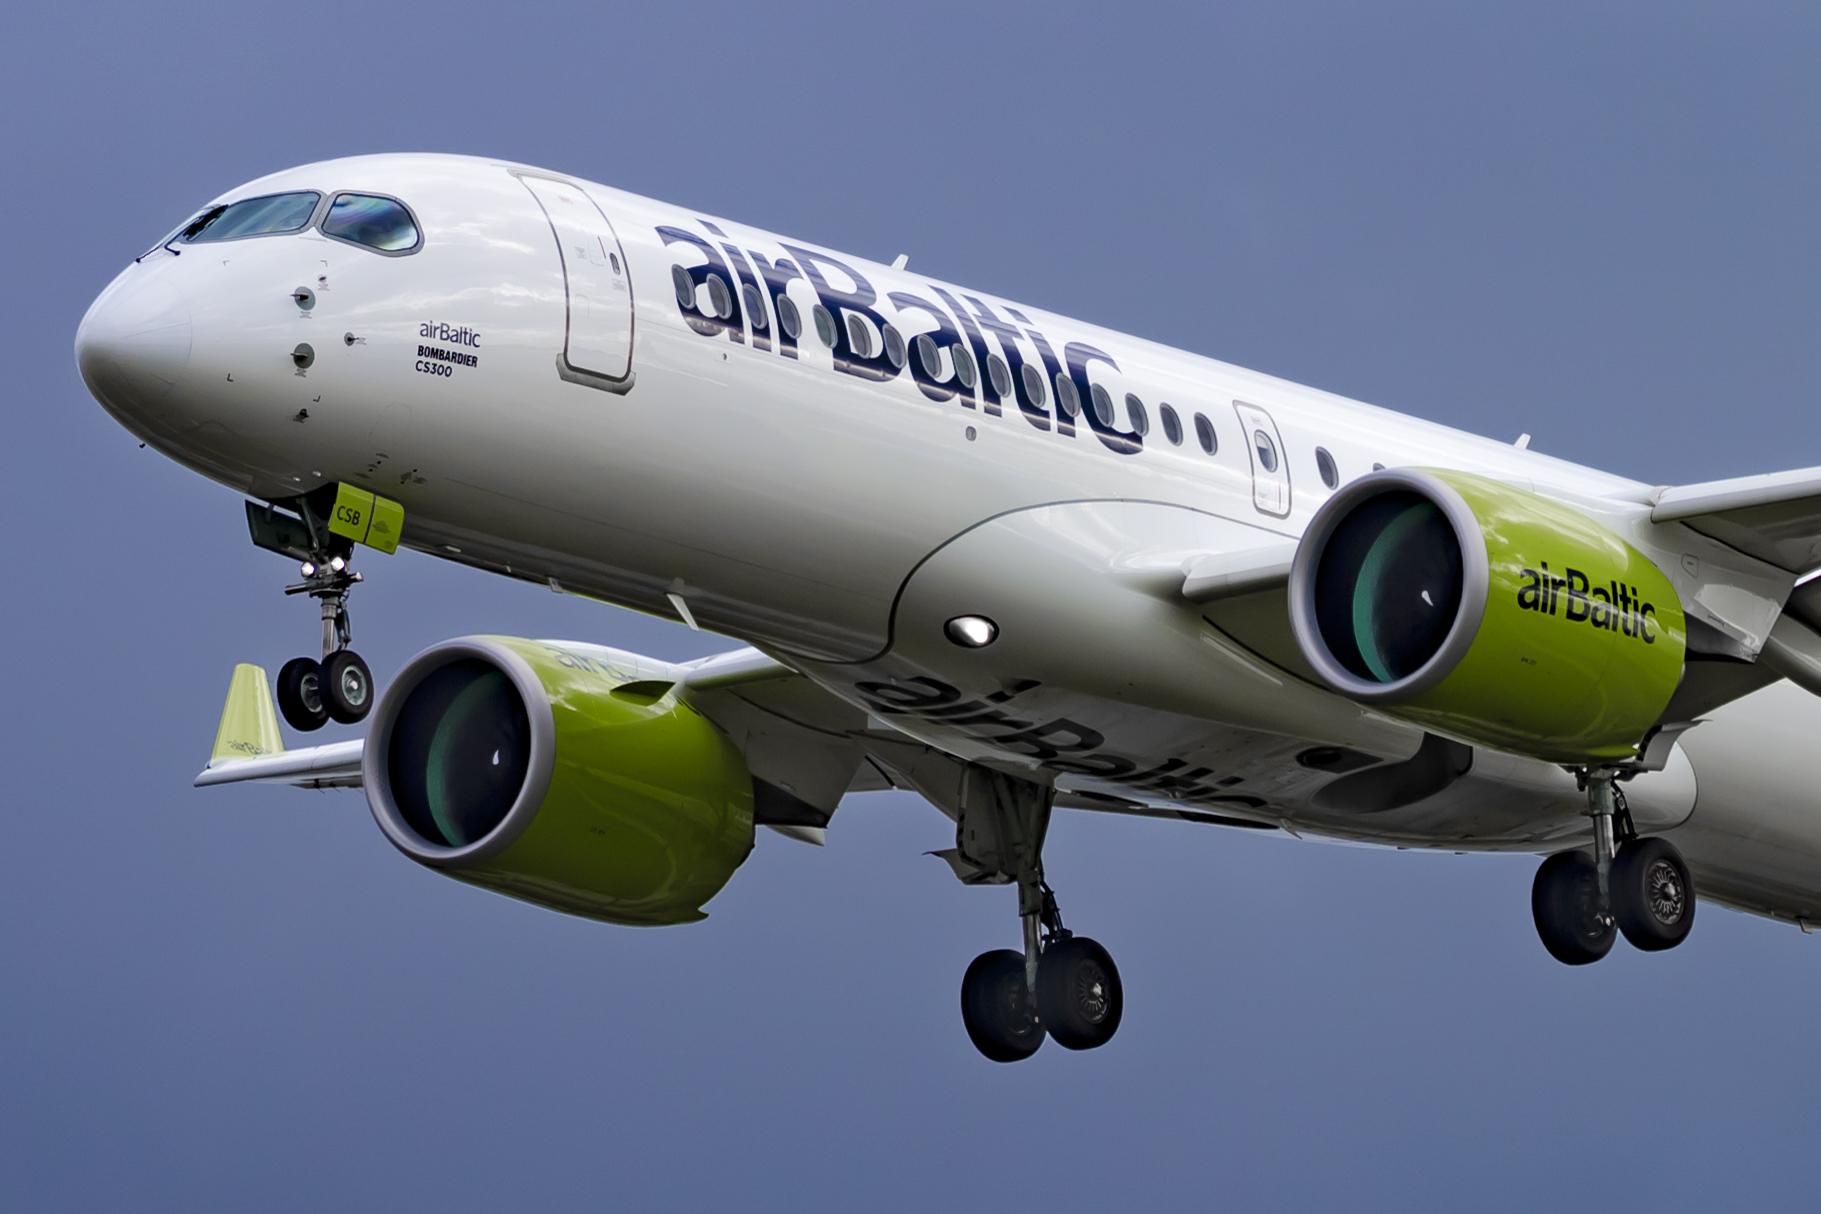 En Airbus A220-300 fra airBaltic. Foto: © Thorbjørn Brunander Sund, Danish Aviation Photo